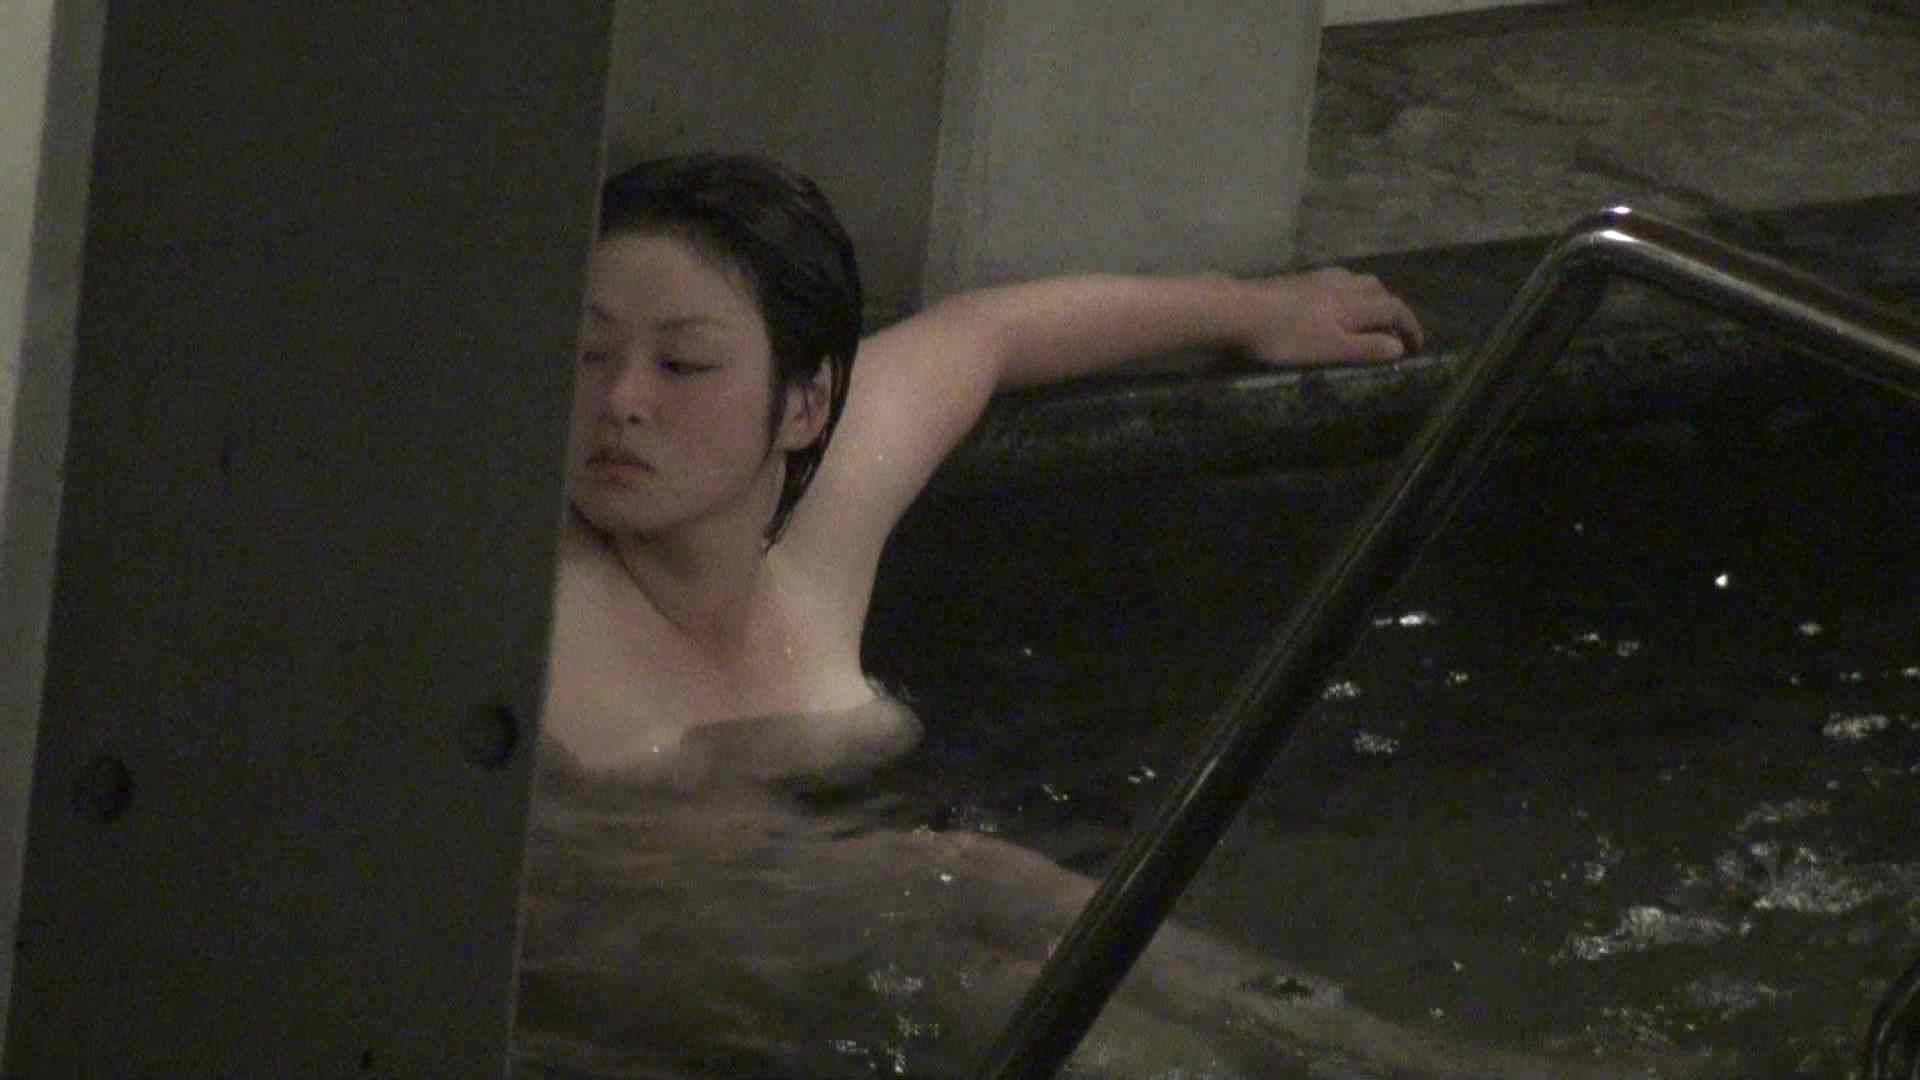 Aquaな露天風呂Vol.338 露天風呂編  82PIX 46